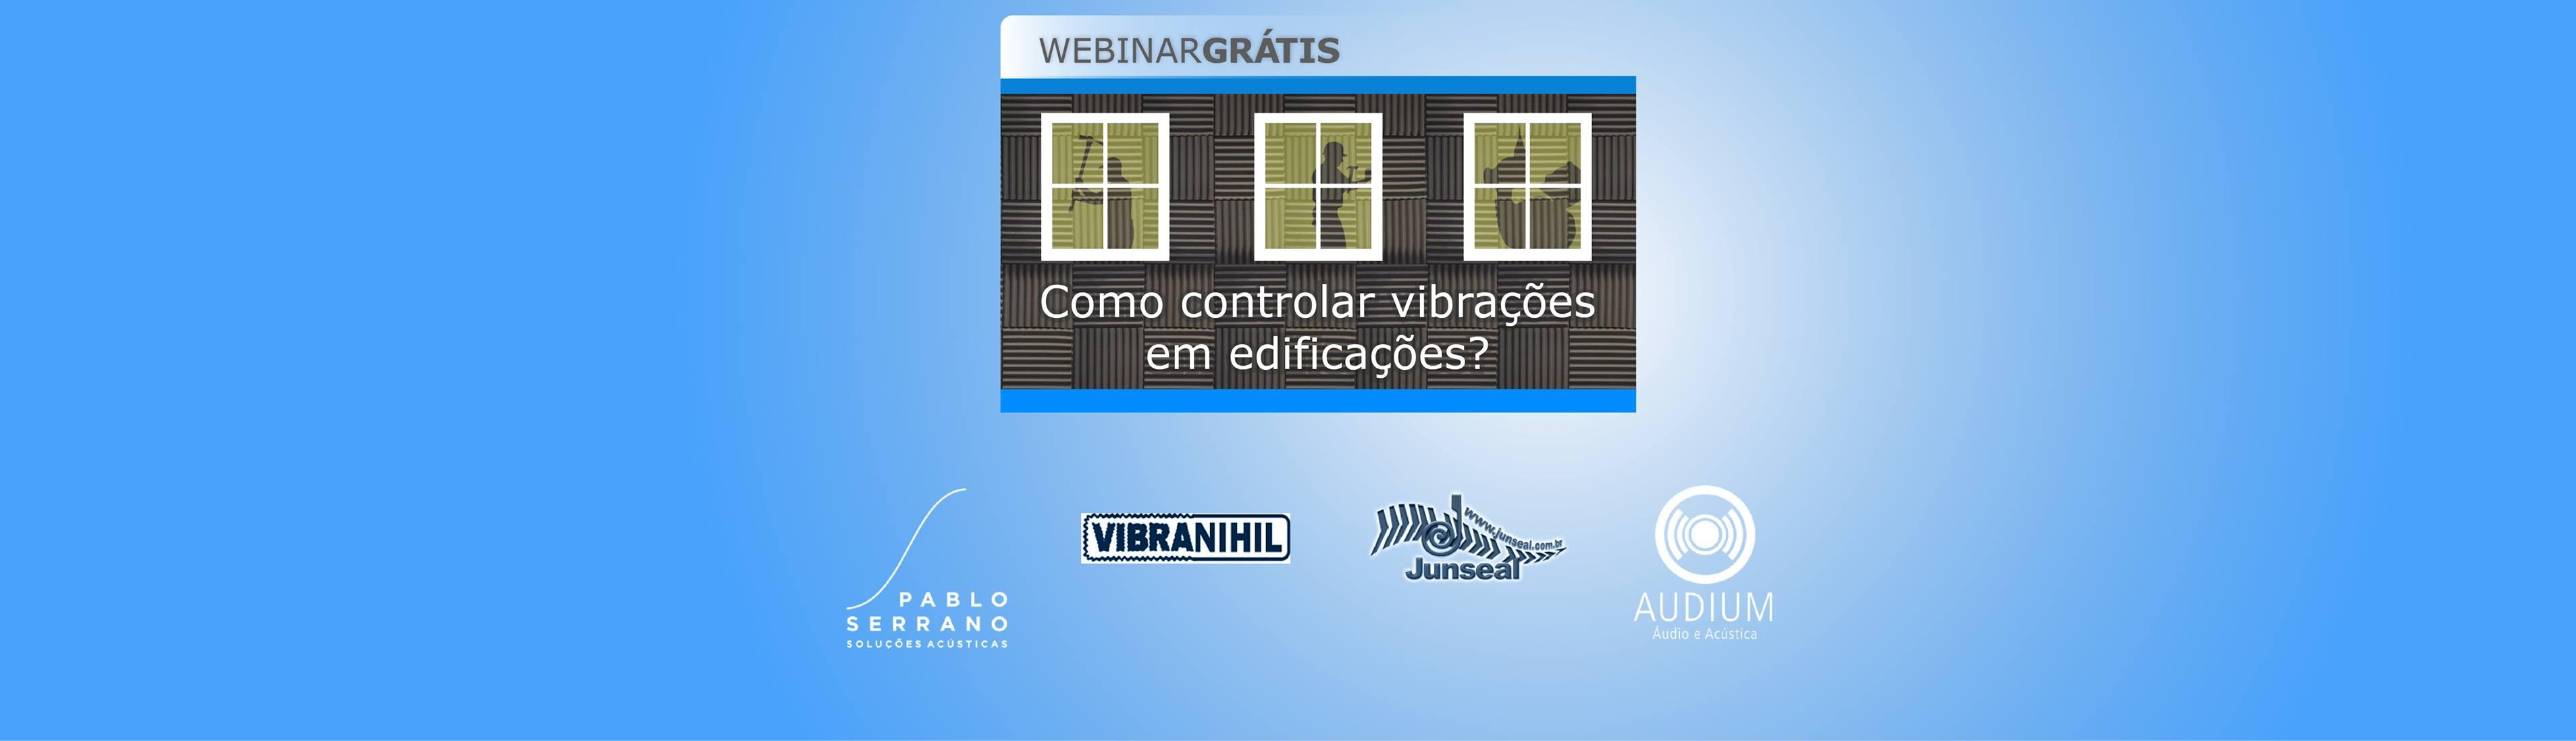 Banner webinar de vibrações